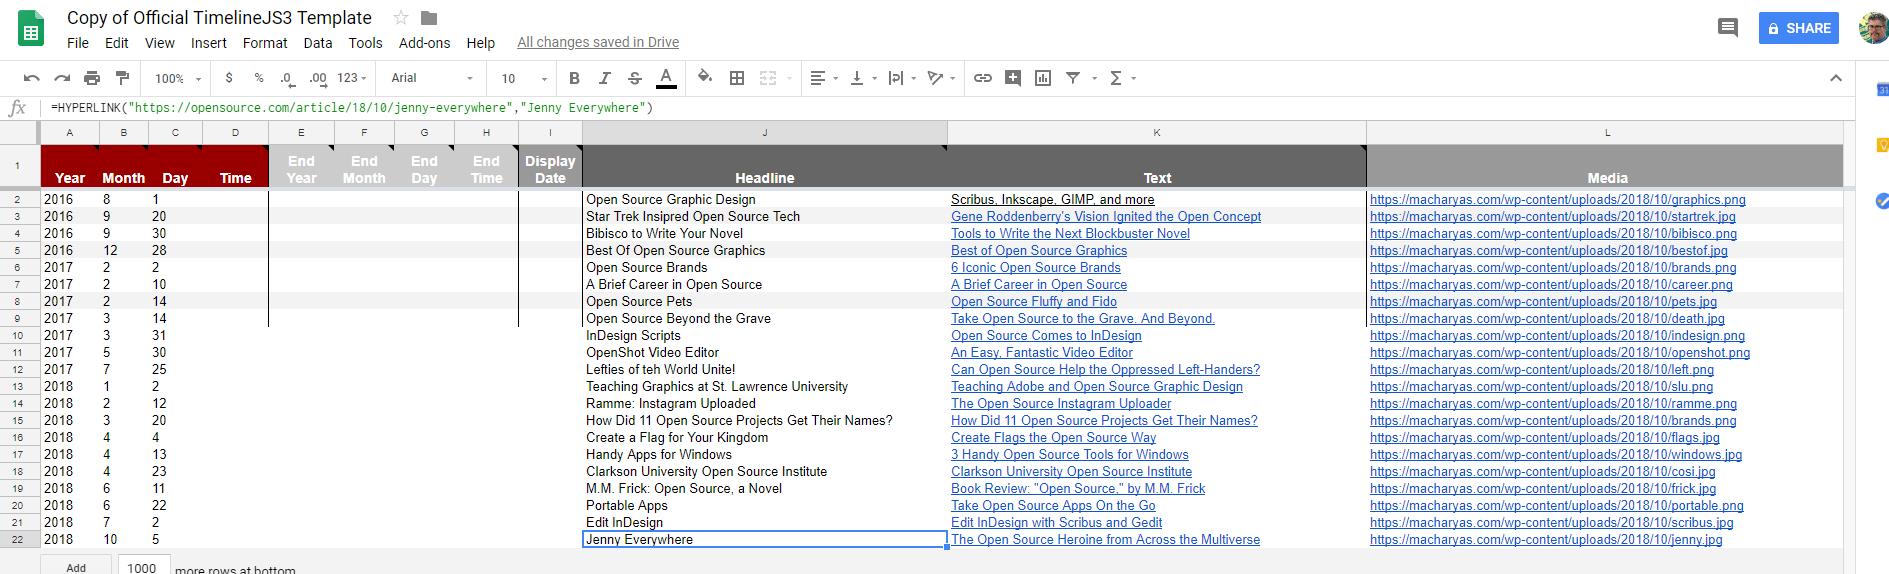 timelinejs an interactive javascript timeline building tool